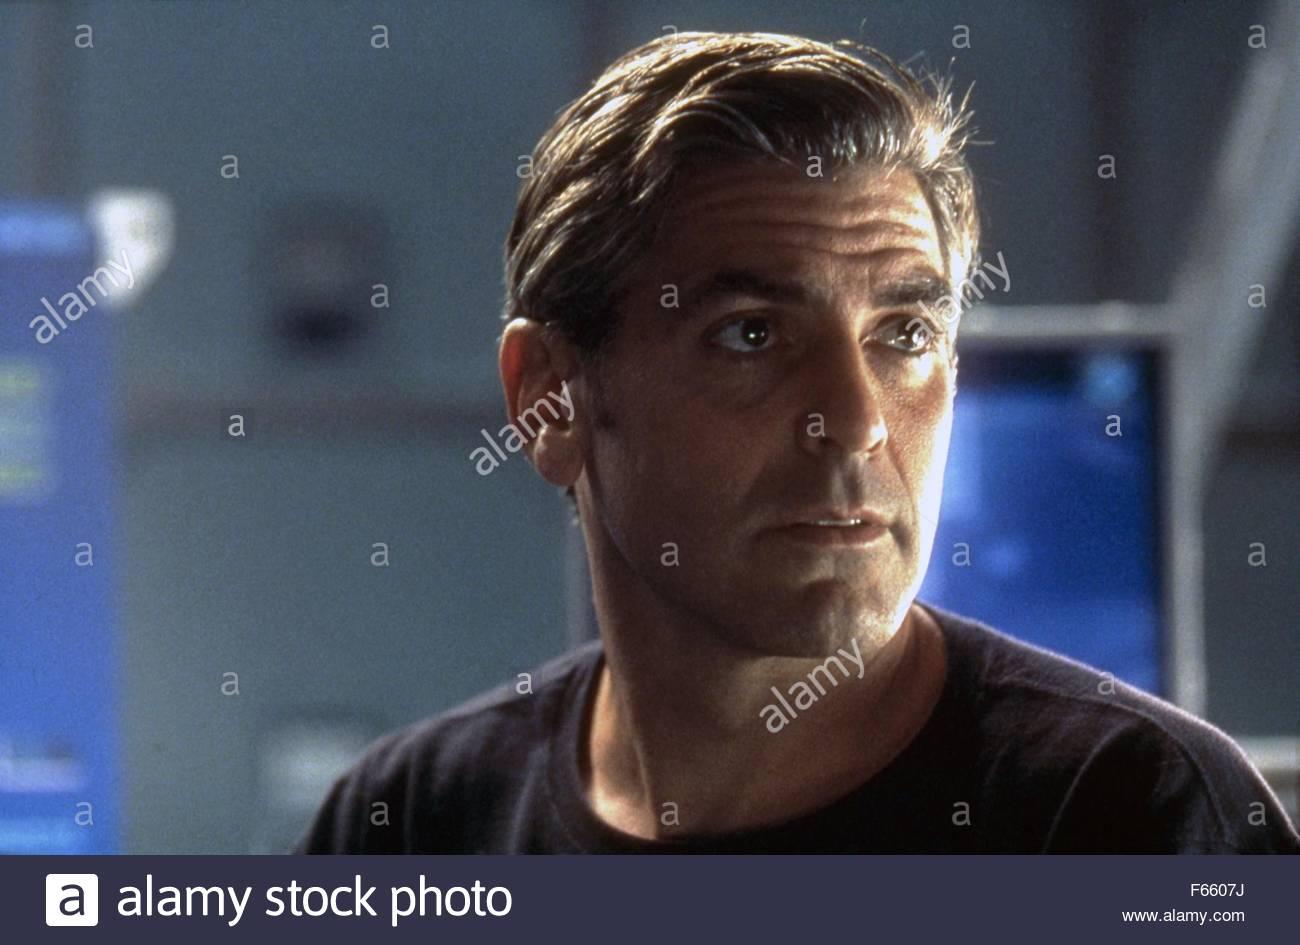 Solaris Year 2002 USA Director Steven Soderbergh George Clooney 1300x945